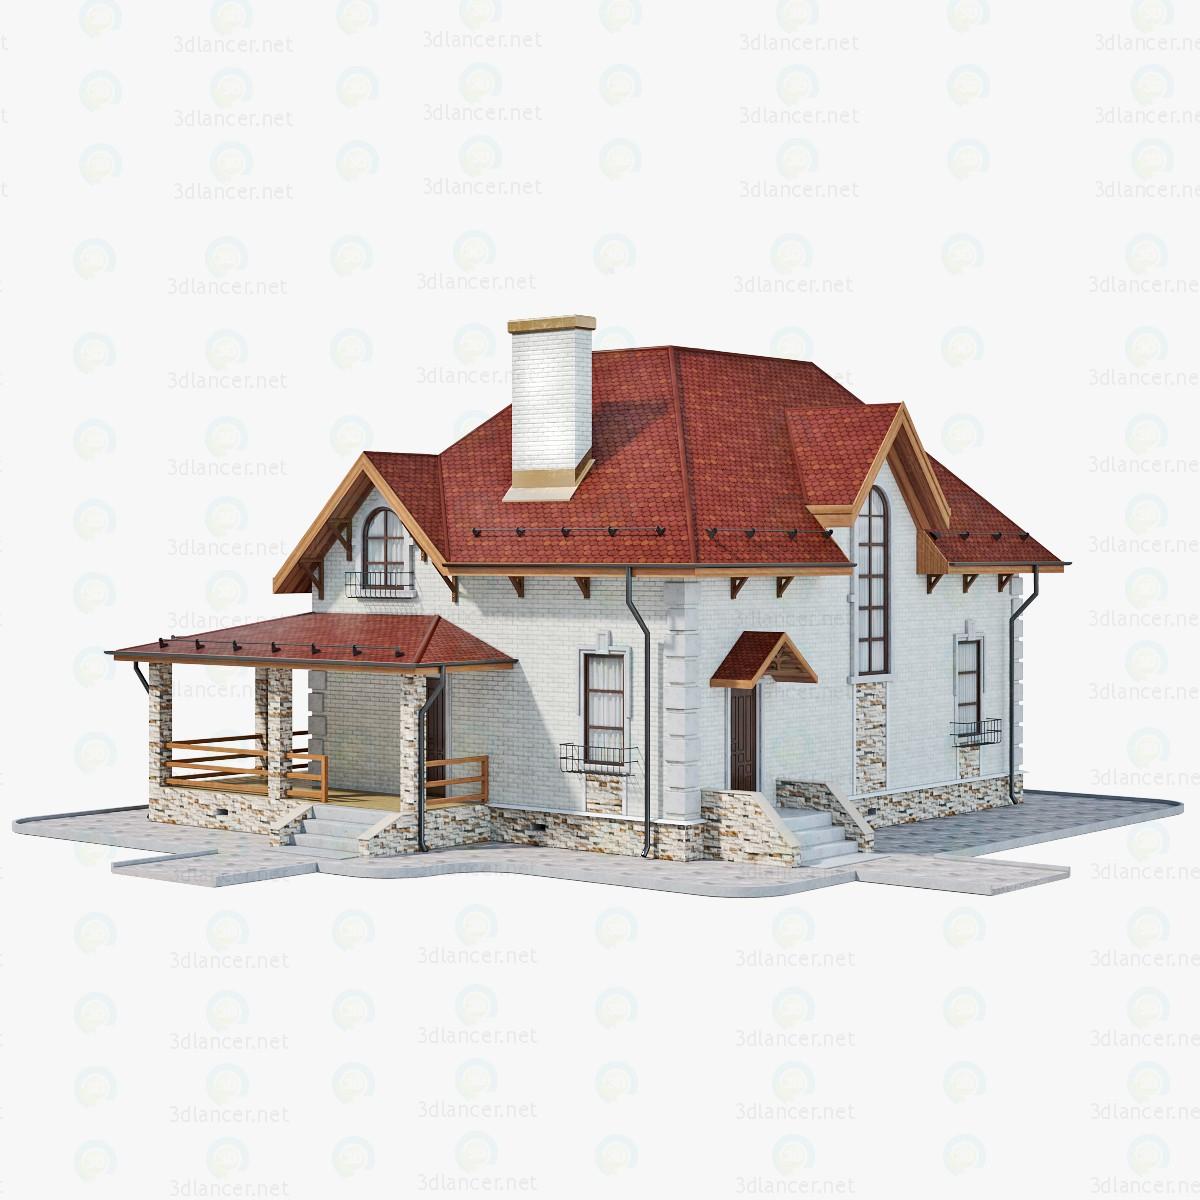 Casa ladrillo - 1 3D modelo Compro - render